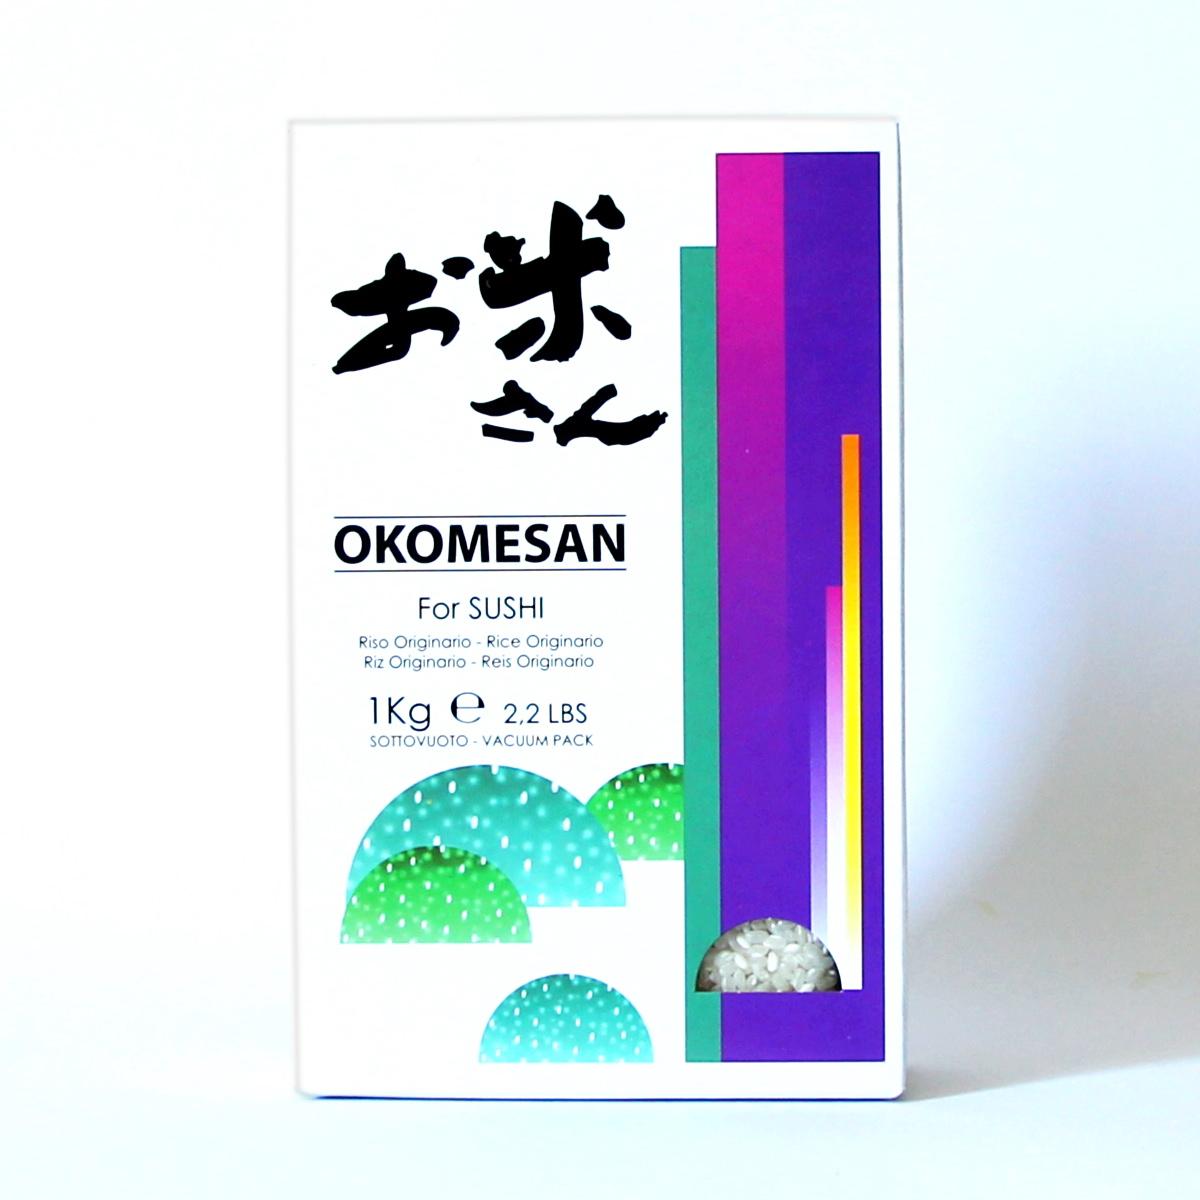 Reis 1kg (Rundkornreis), OKOMESAN